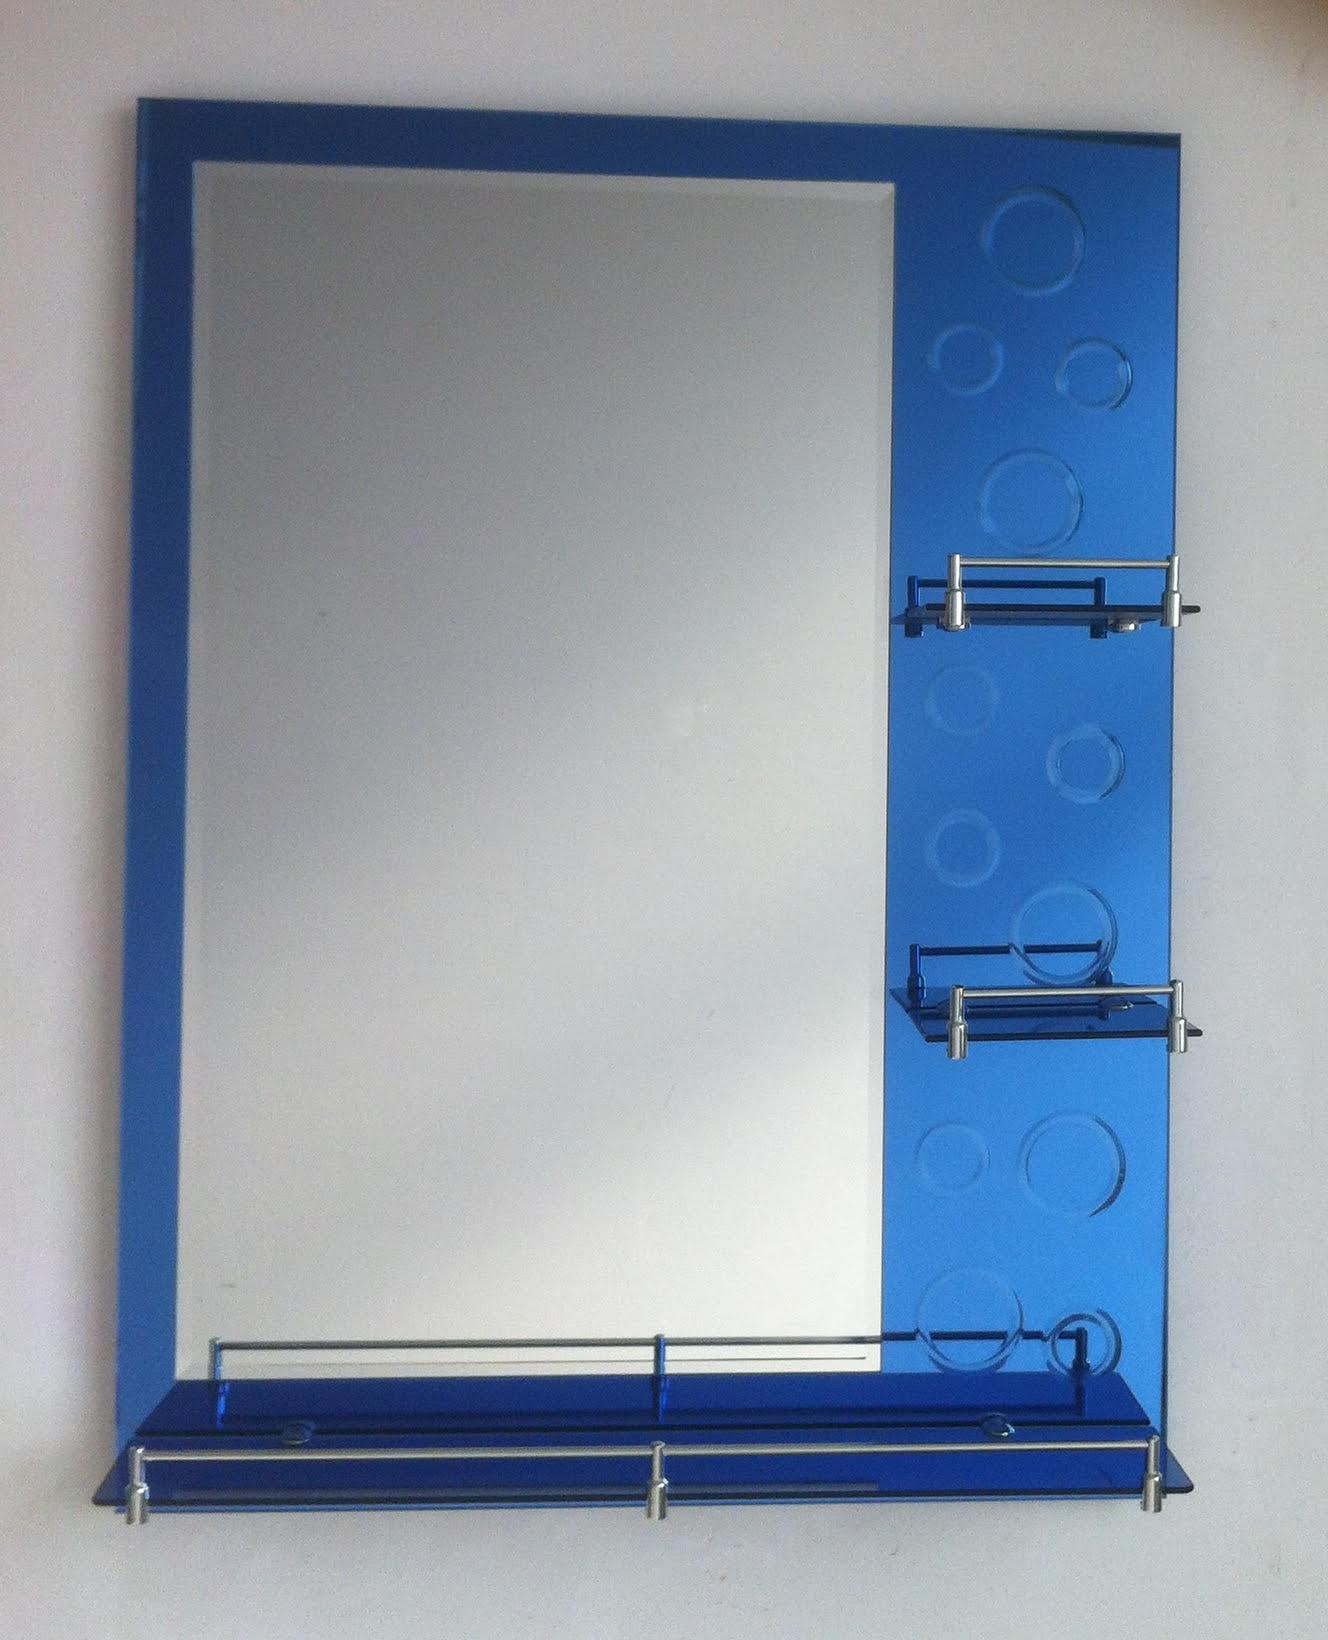 Miroir 80x60cm Bleu Atlantic+ Lampe  h-1025 bleu